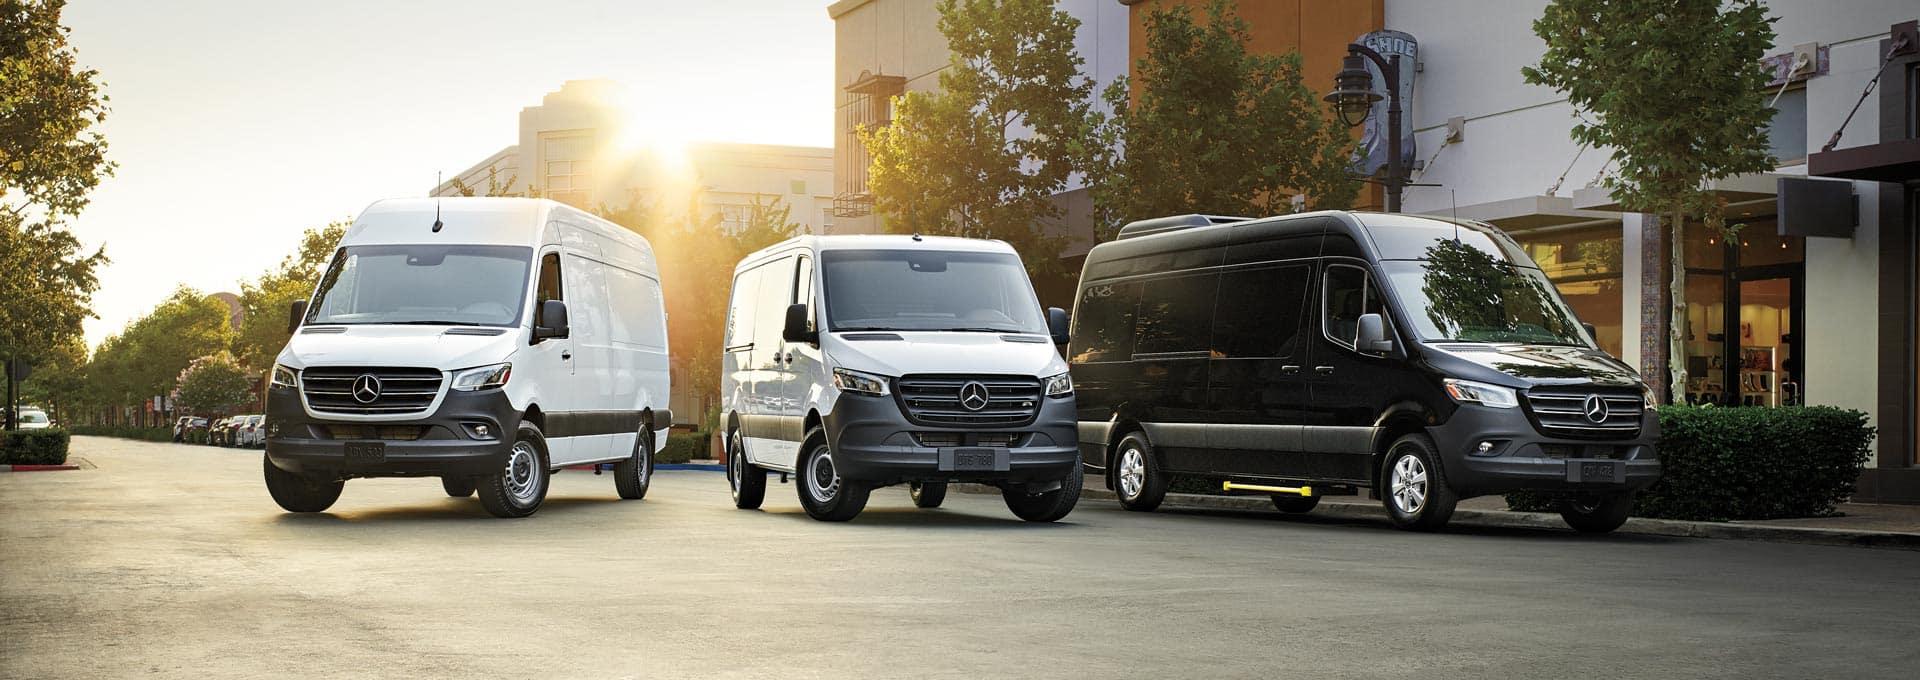 Mercedes-Benz Sprinter Vans Lease Specials